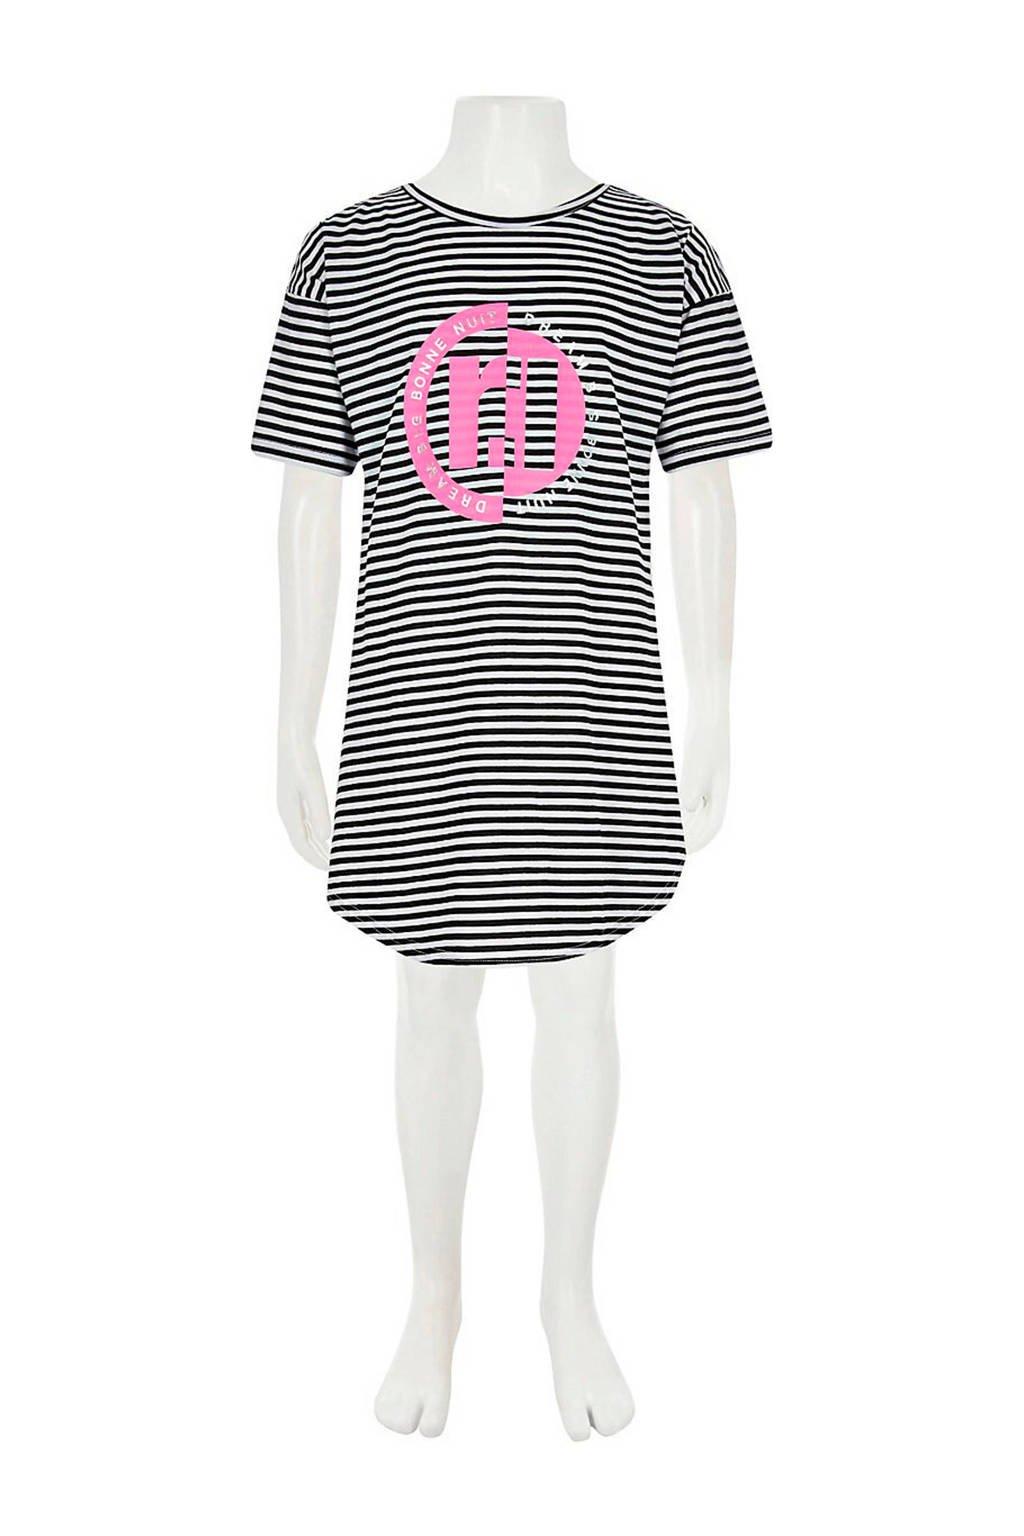 River Island gestreepte nachthemd zwart/wit, Zwart/wit/roze